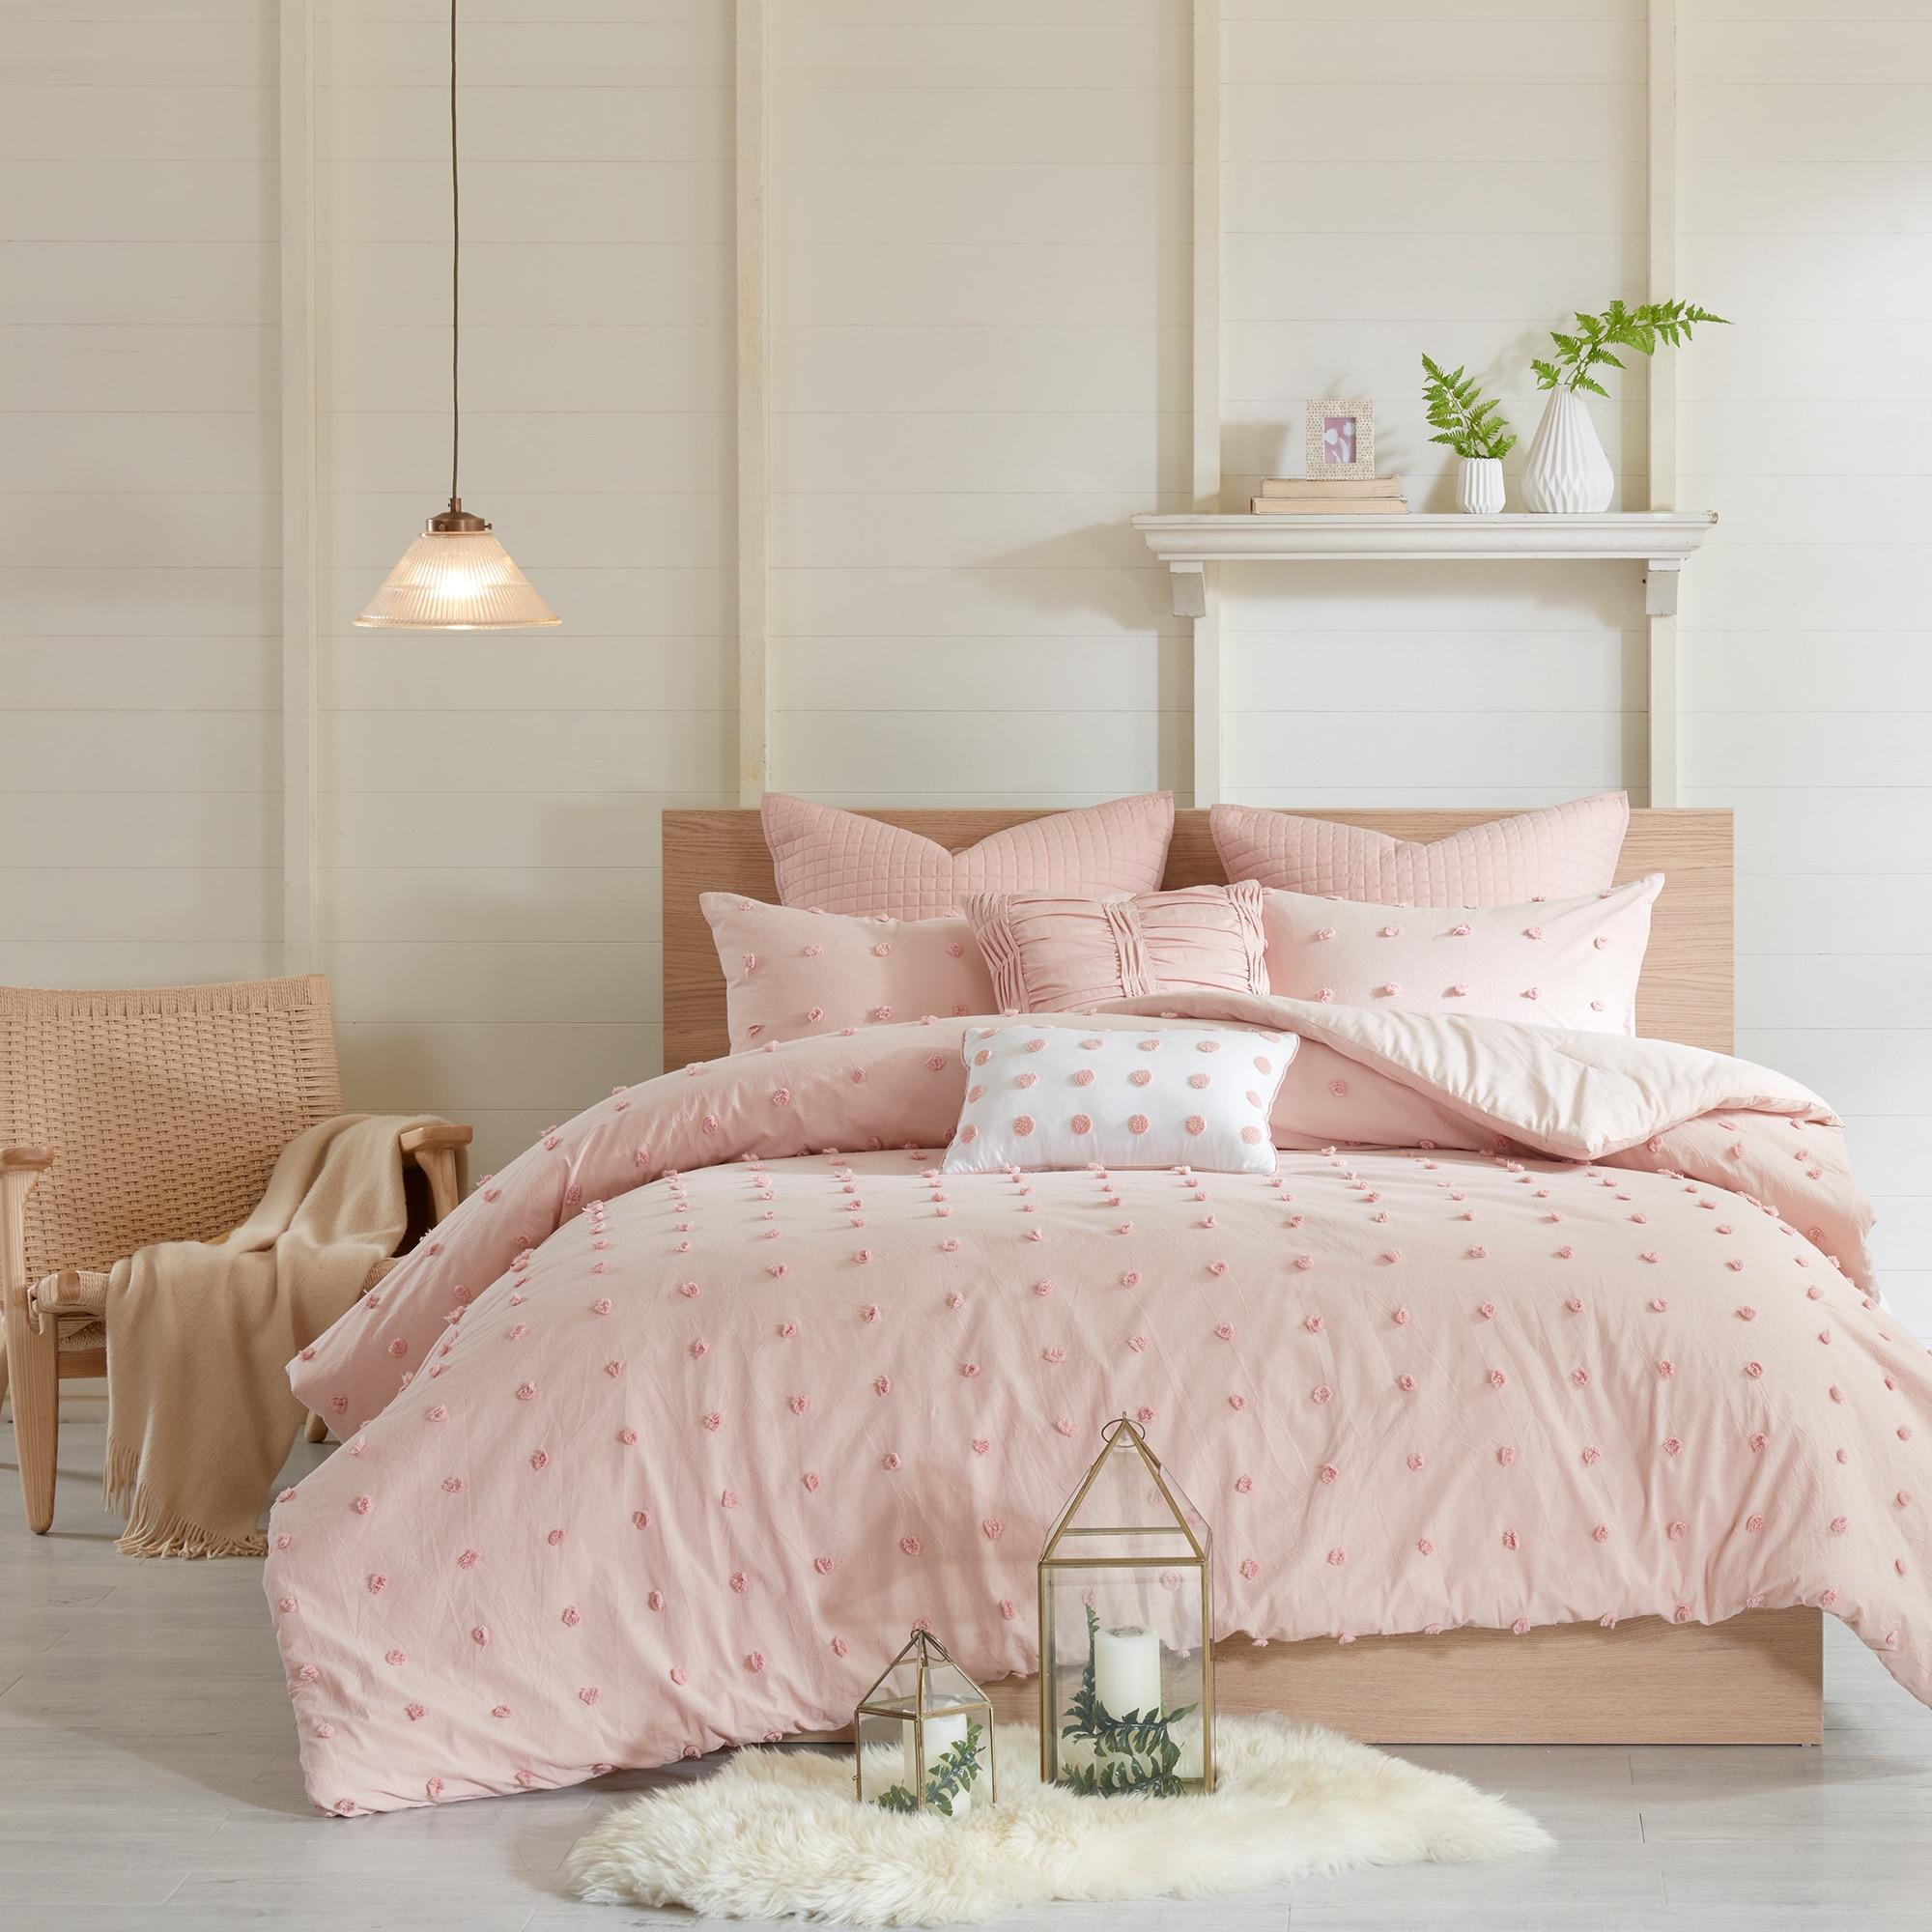 product comforter bed nicolette printed urban piece bedding cotton yellow set bath overstock habitat com